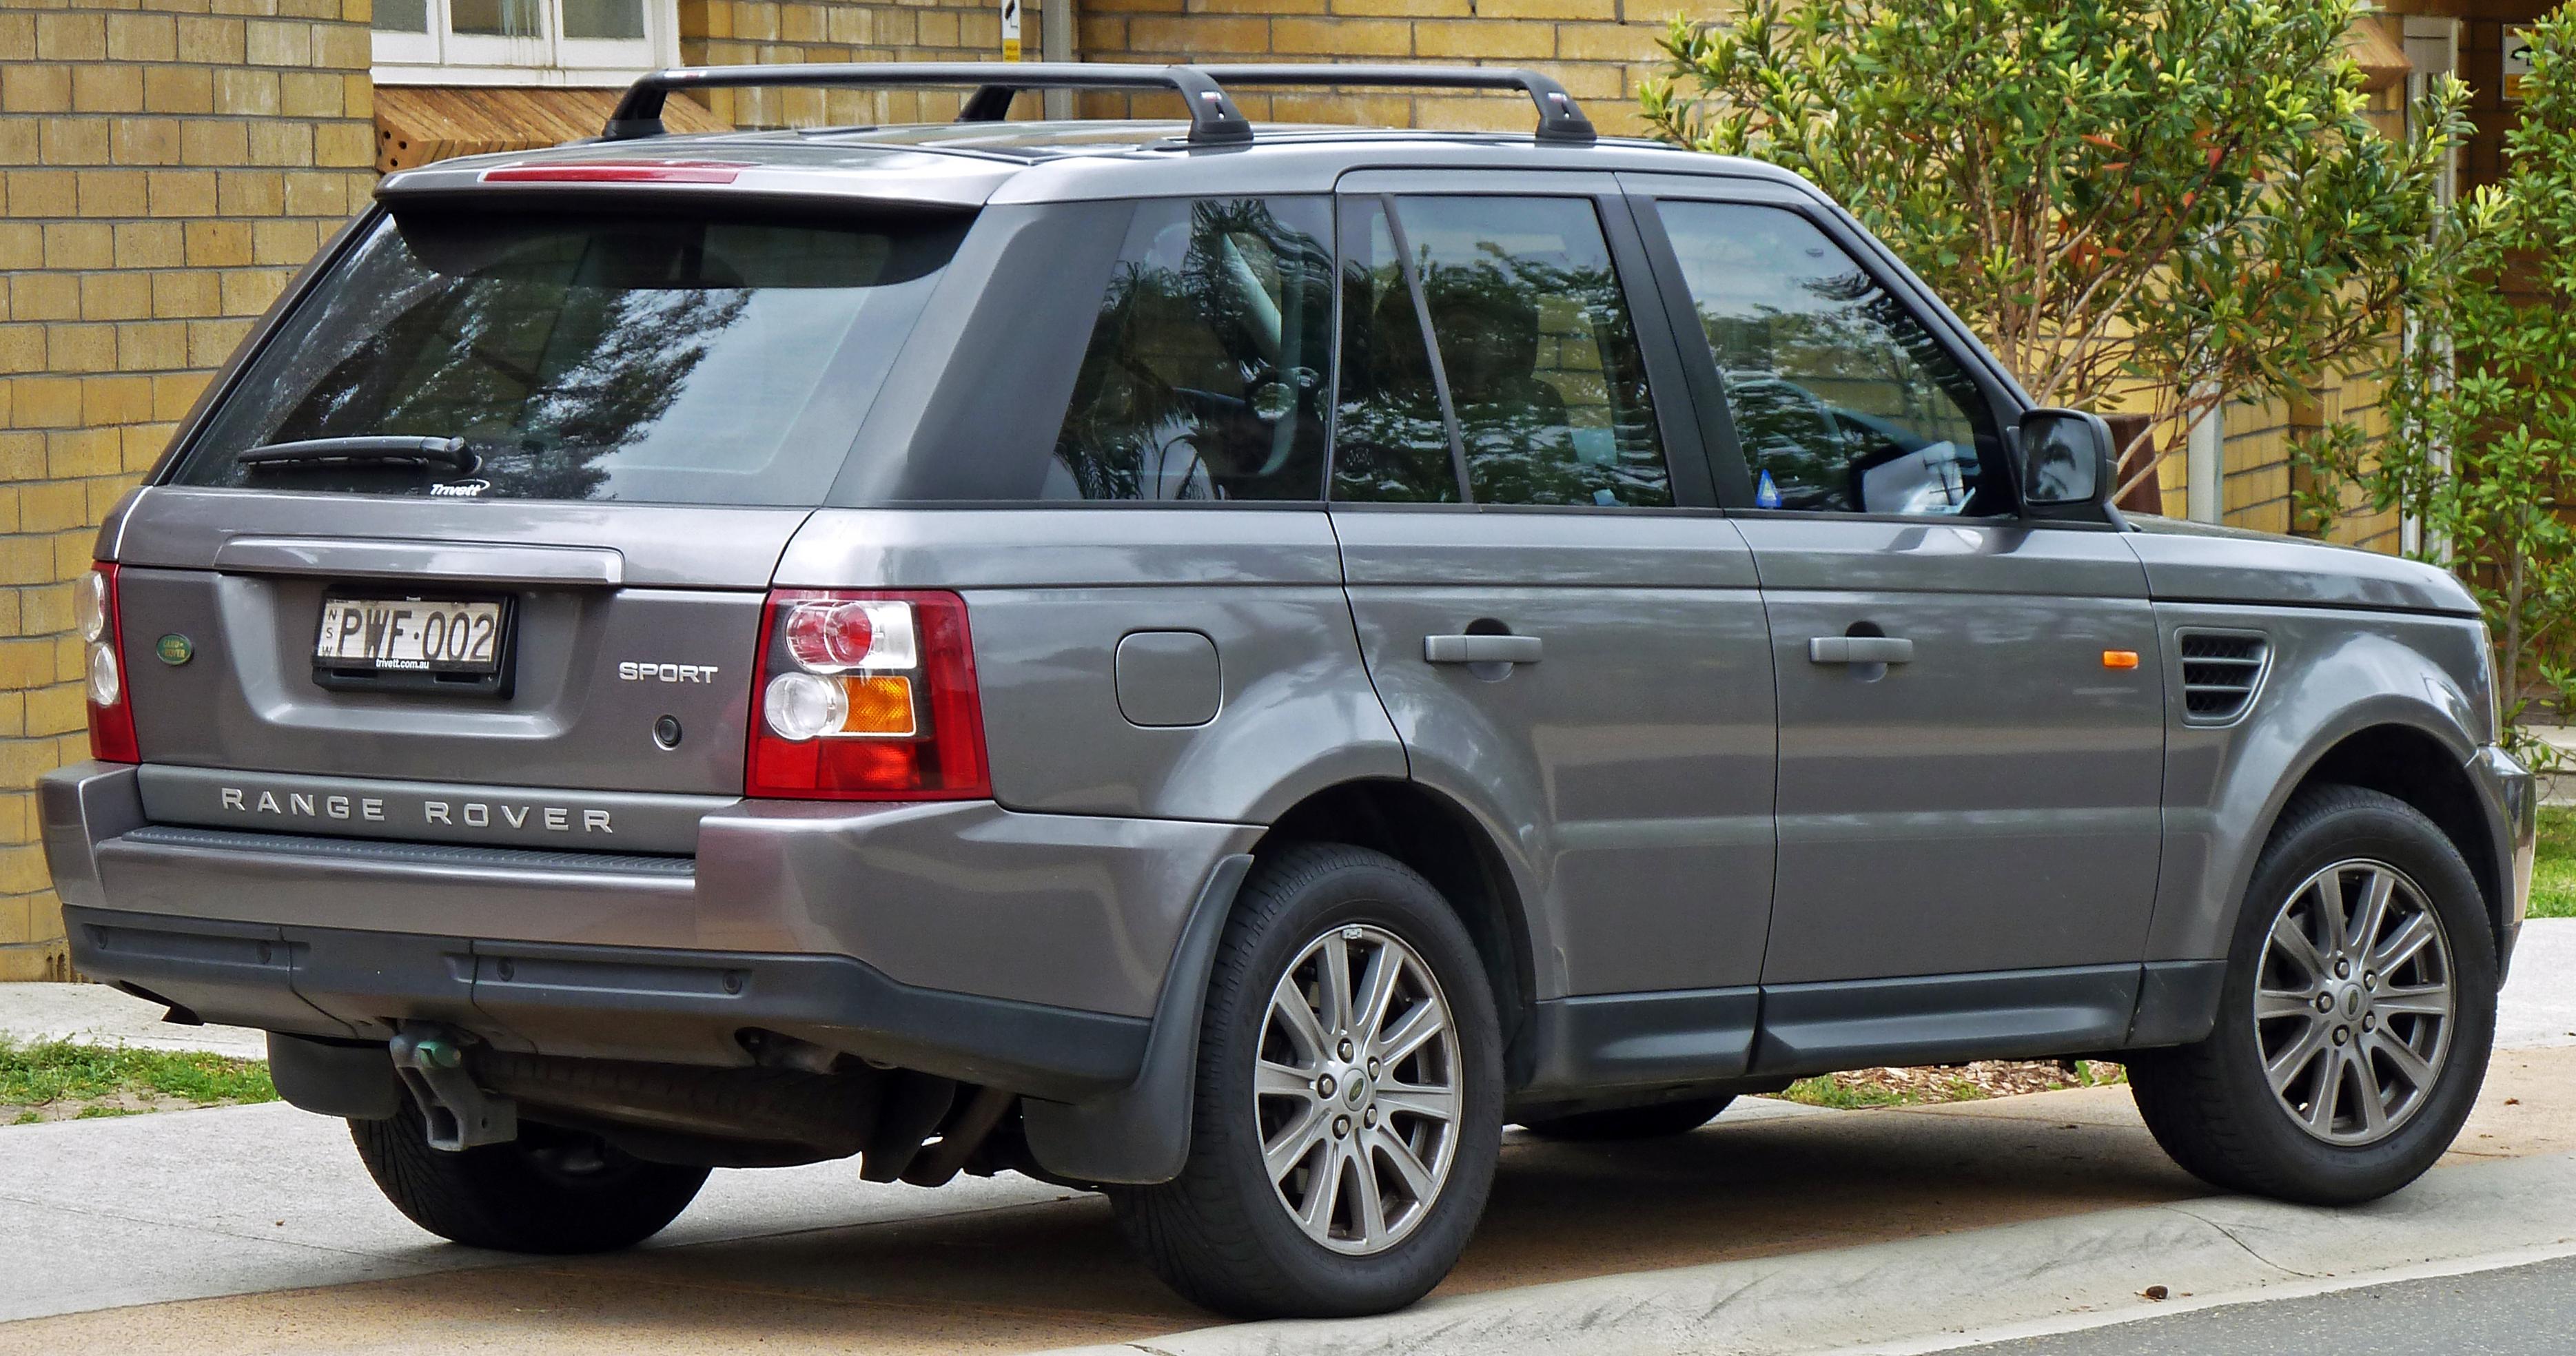 2008 Land Rover Range Rover Sport Image 20